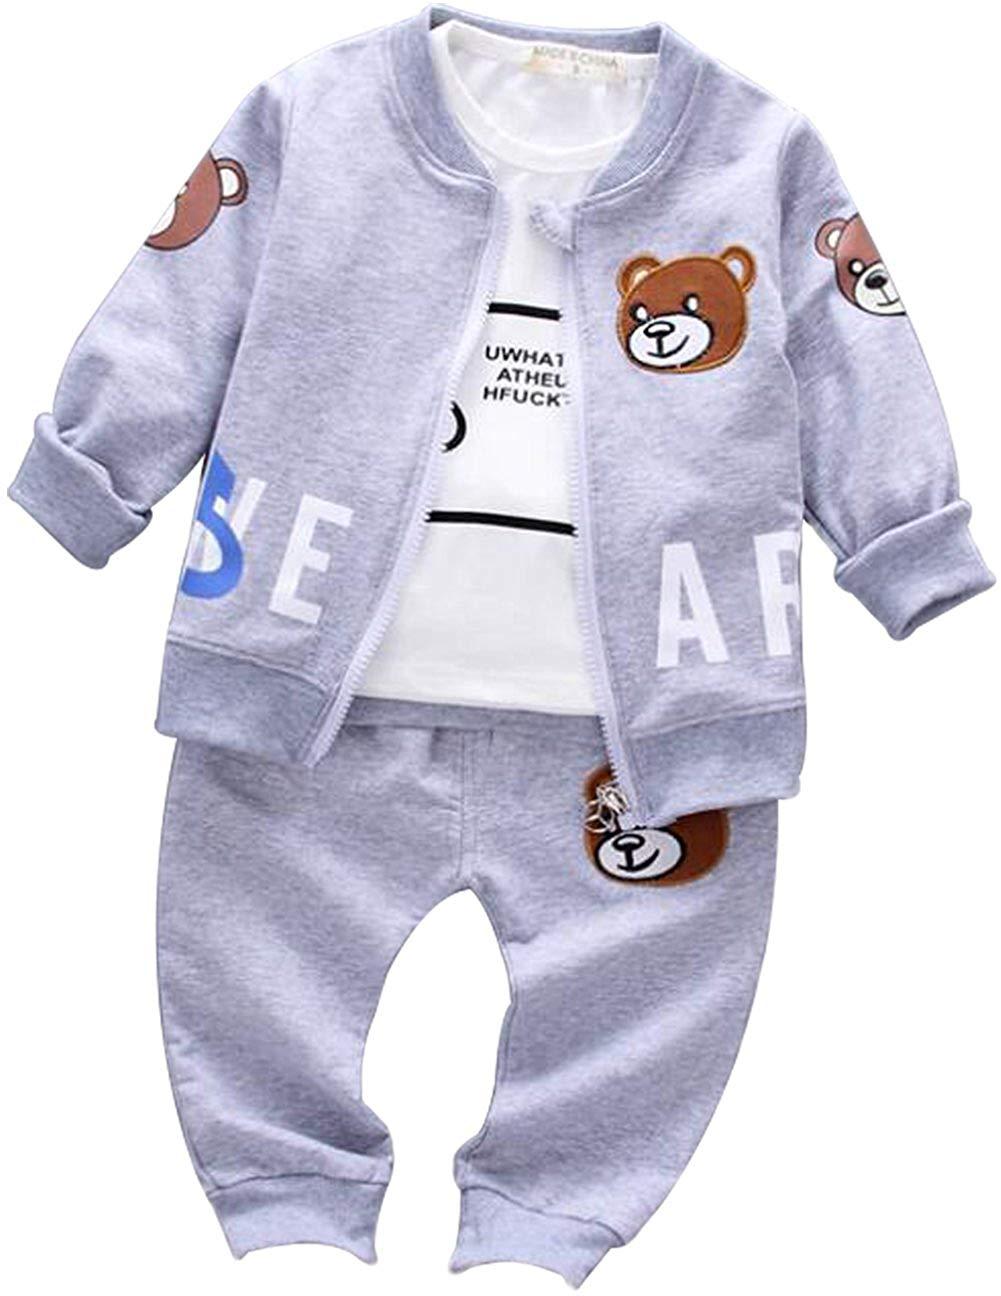 Kids Baby Boys Girls Cartoon Bear Jacket+Letters Print T-shirt+Pants 3Pcs Set